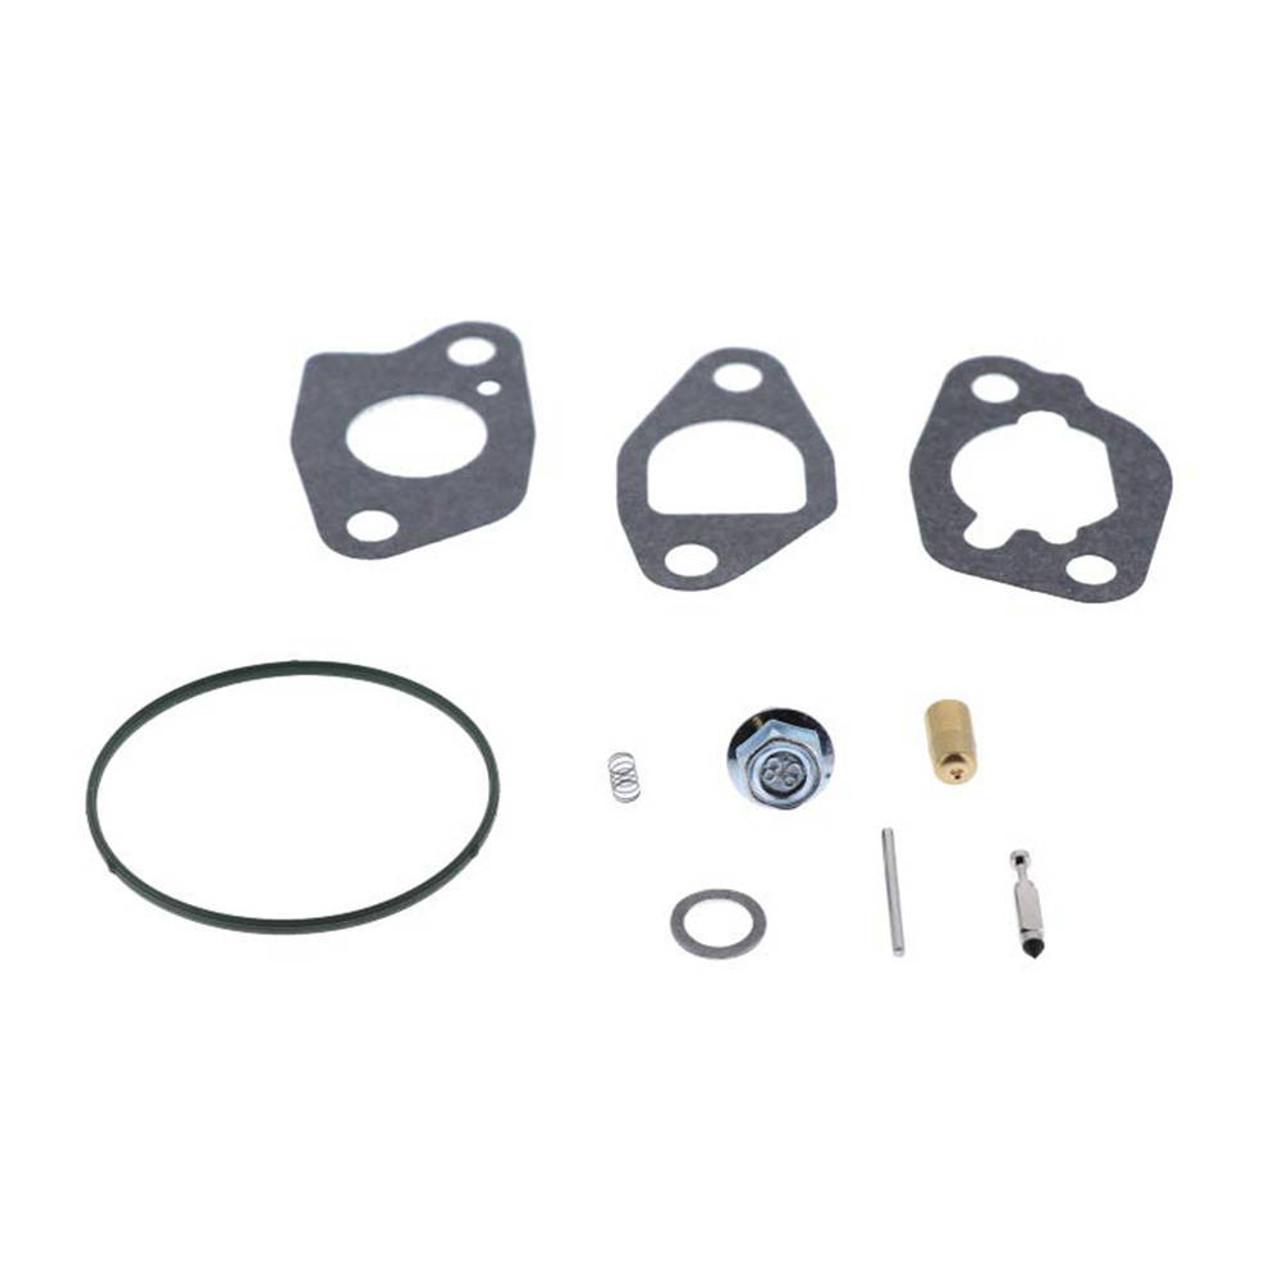 Briggs /& Stratton 594636 Carburetor Overhaul Kit